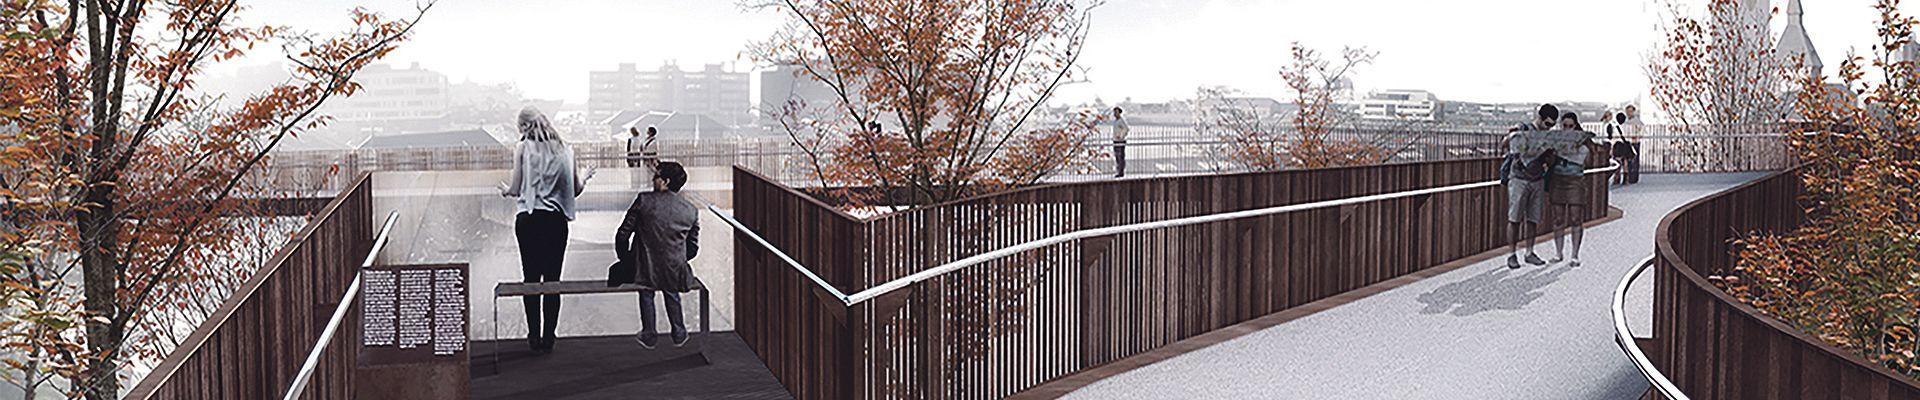 bygningsingeniør konstruktionsingeniør københavn